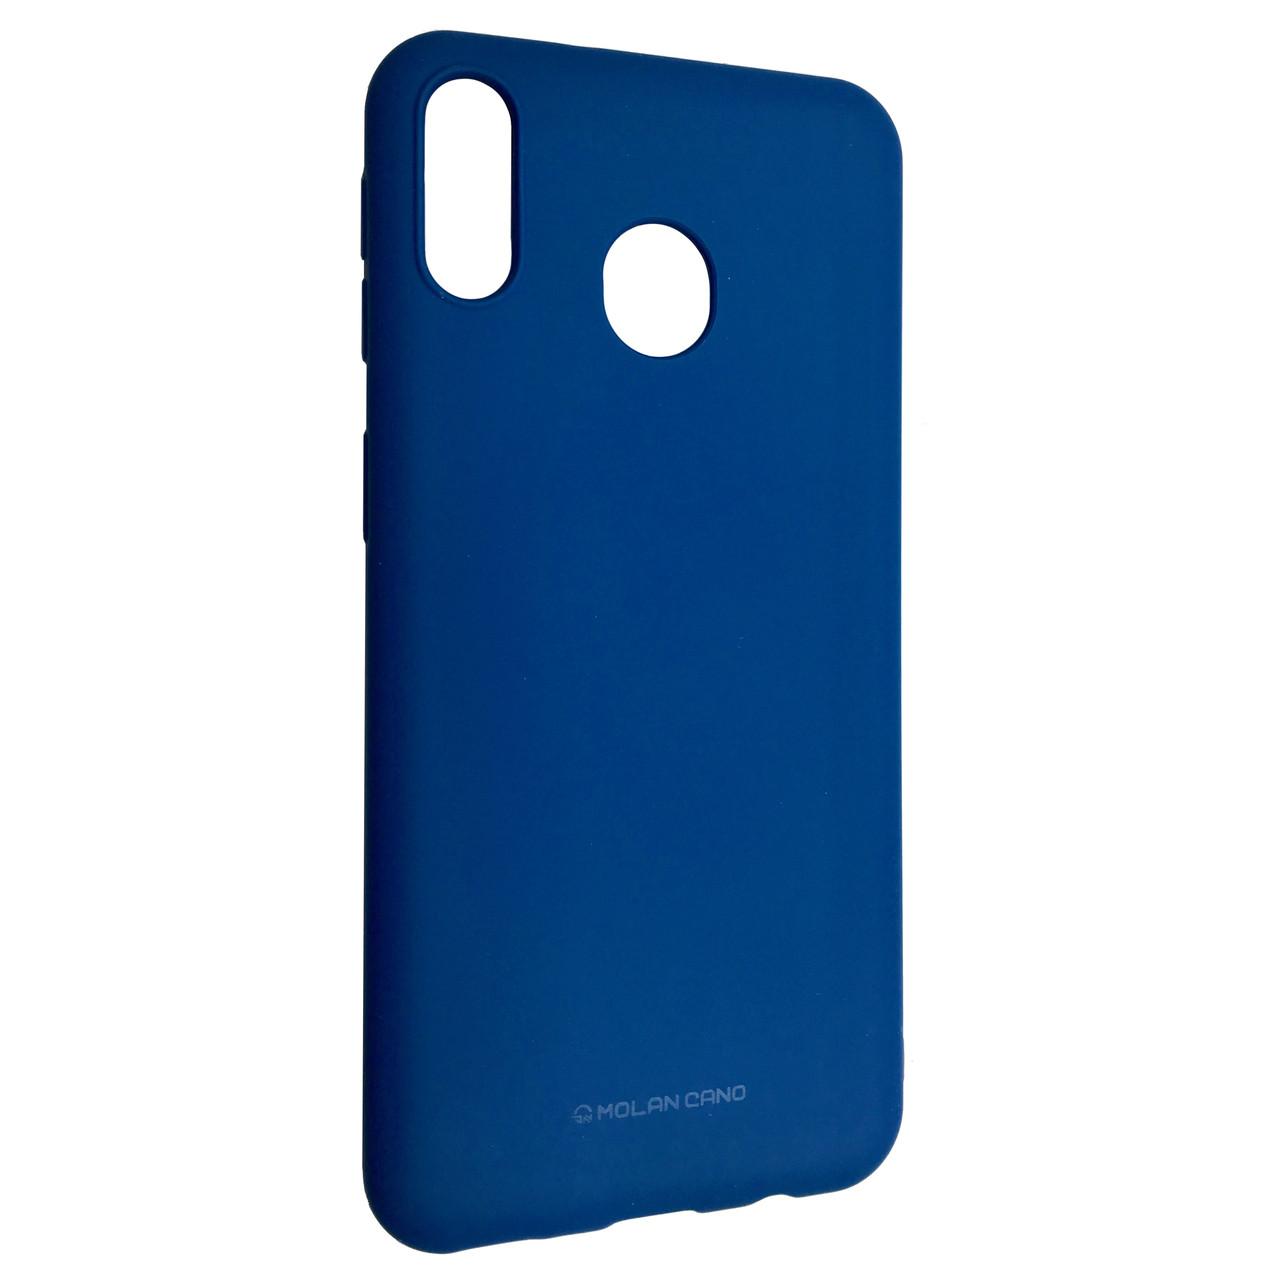 Чехол Hana Molan Cano Samsung M20 (blue)